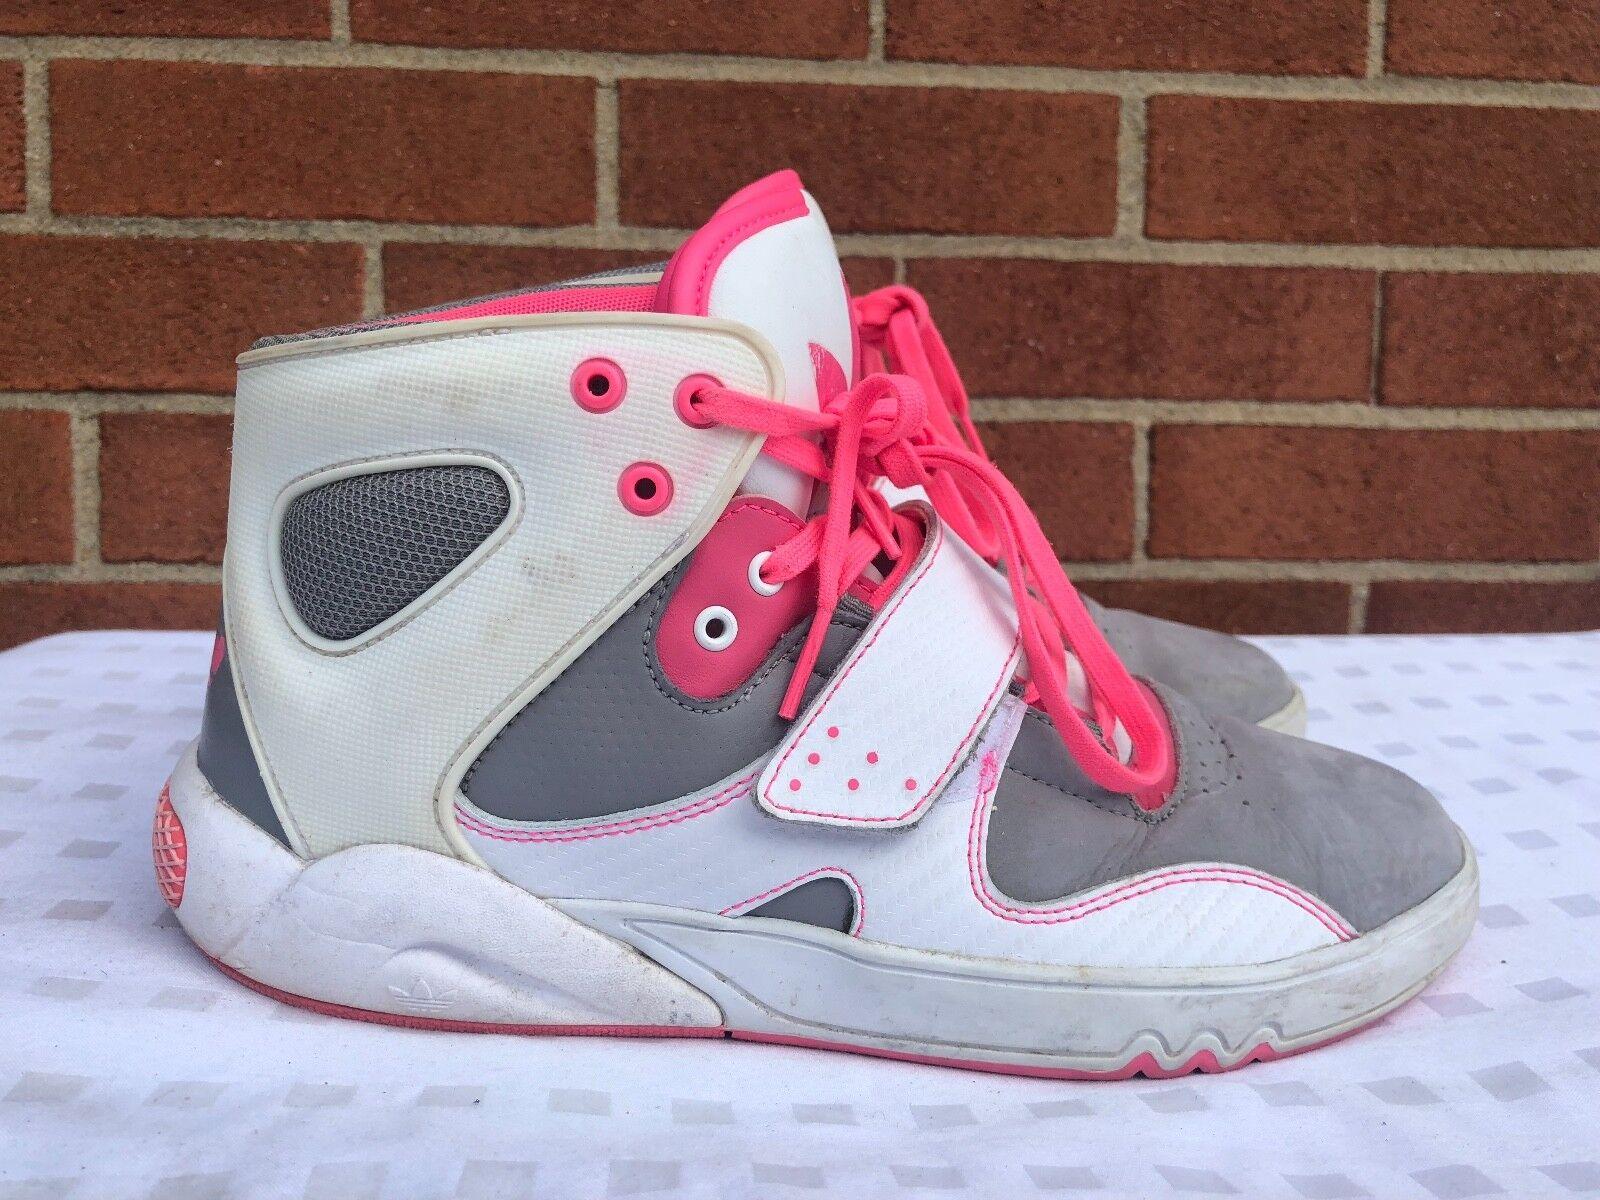 Adidas femme HI Top Original Chaussures Blanc Gris Rose Taille 7